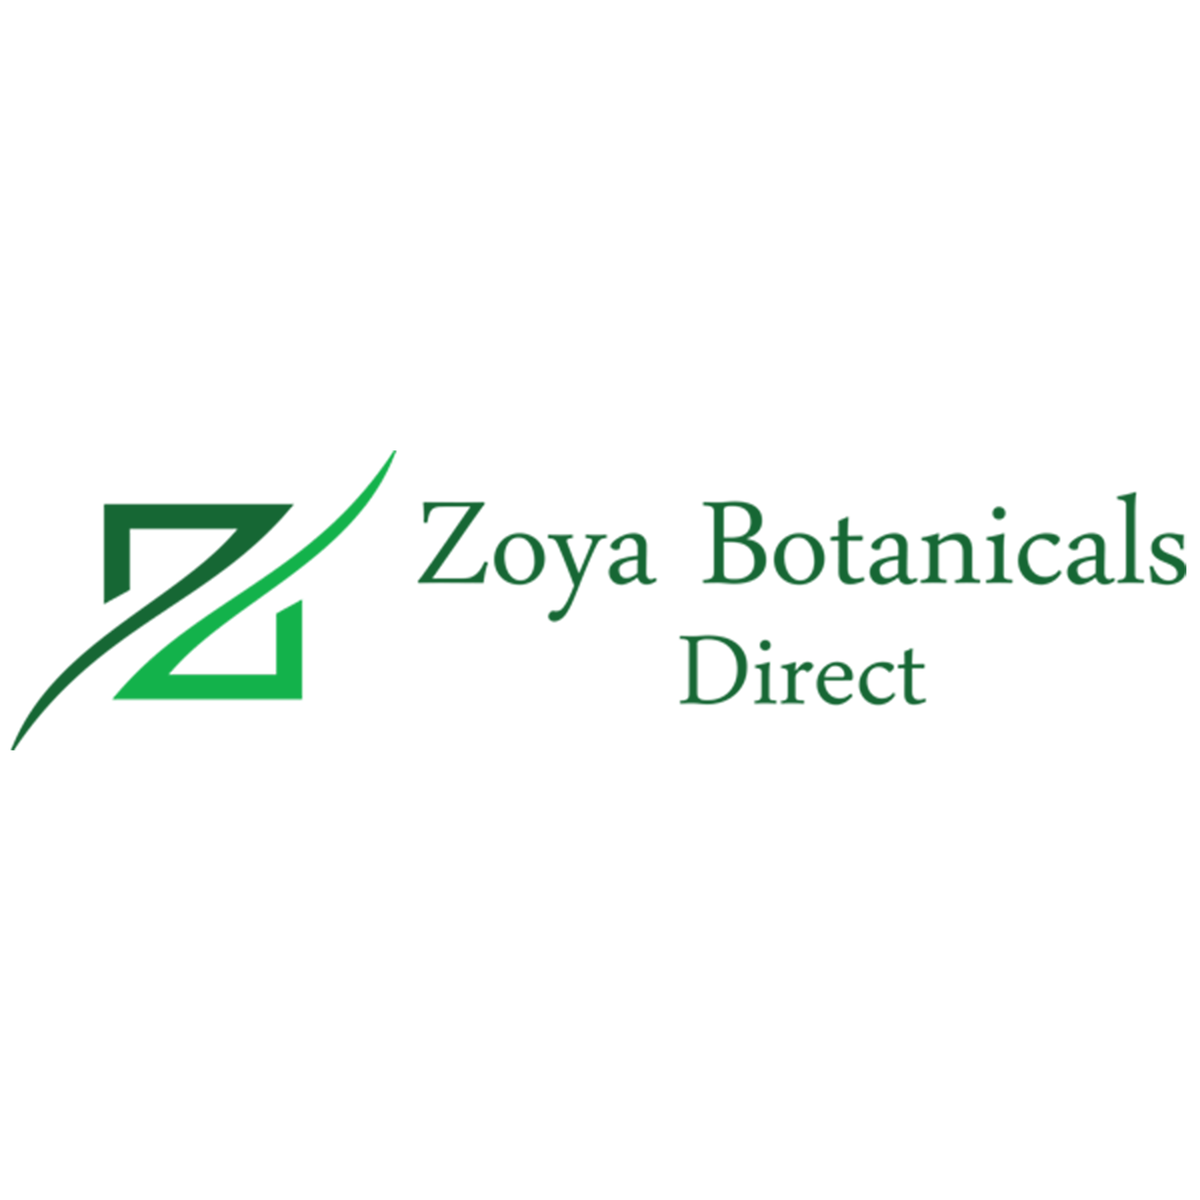 Zoya Botanicals Direct CBD